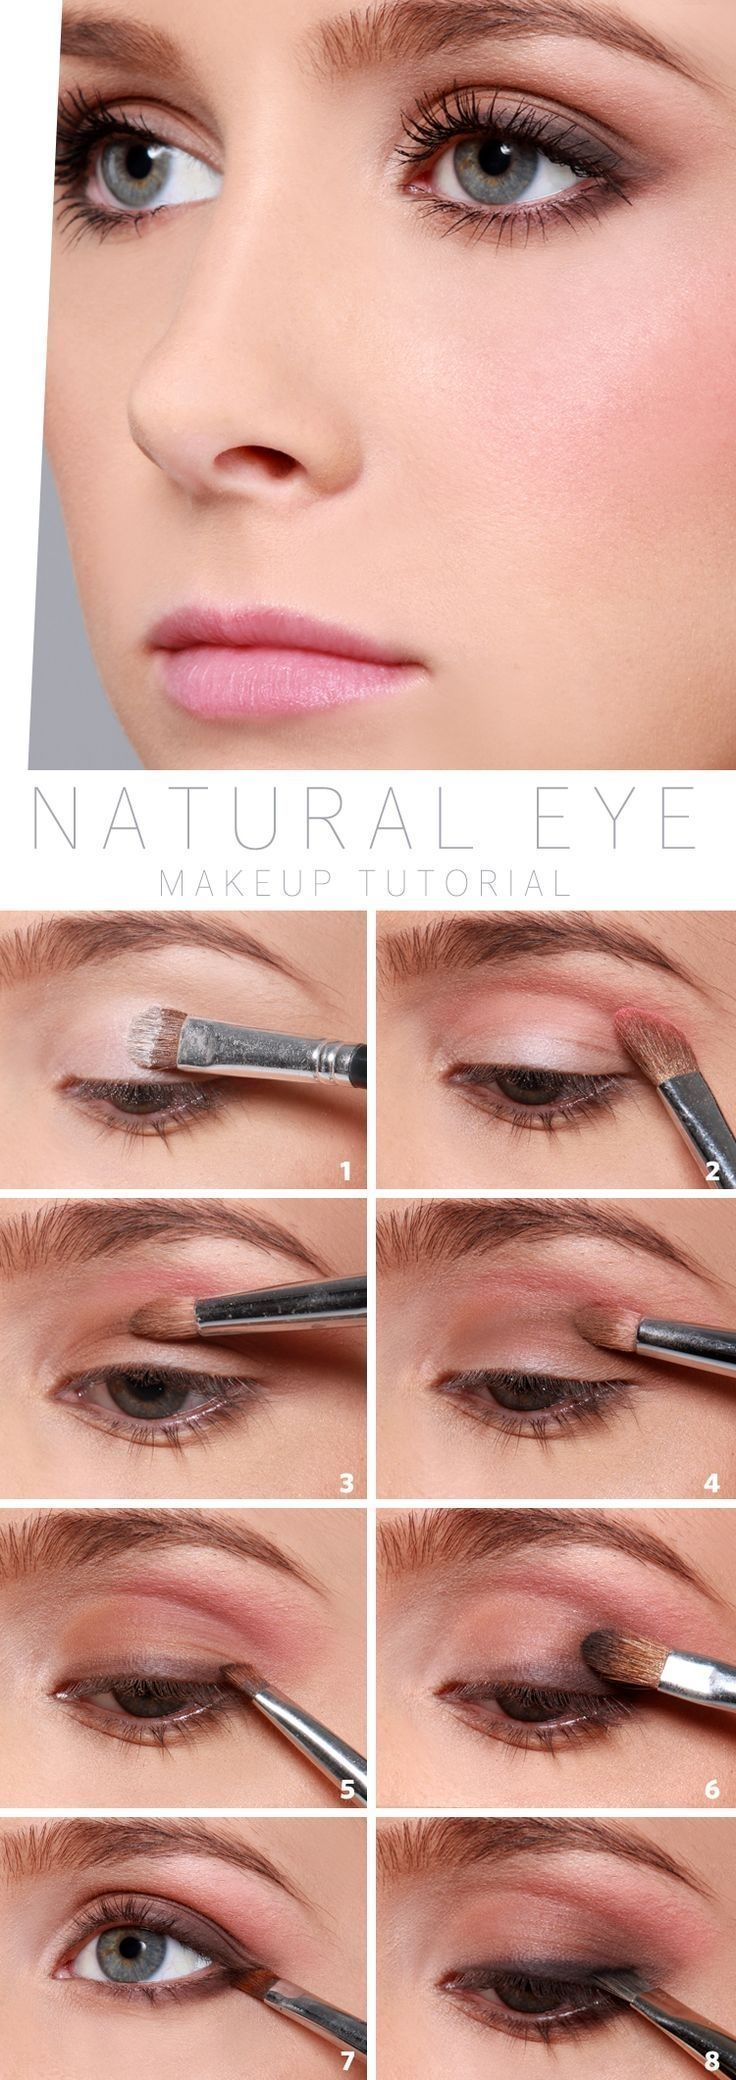 Best Ideas For Makeup Tutorials    Picture    Description  How to Do Natural Eyes | Work Makeup Tips by Makeup Tutorials at | Makeup Tutorials makeuptutorials.c…    - #Makeup https://glamfashion.net/beauty/make-up/best-ideas-for-makeup-tutorials-how-to-do-natural-eyes-work-makeup-tips-by-makeup-tutorials-at-makeup-tutori/